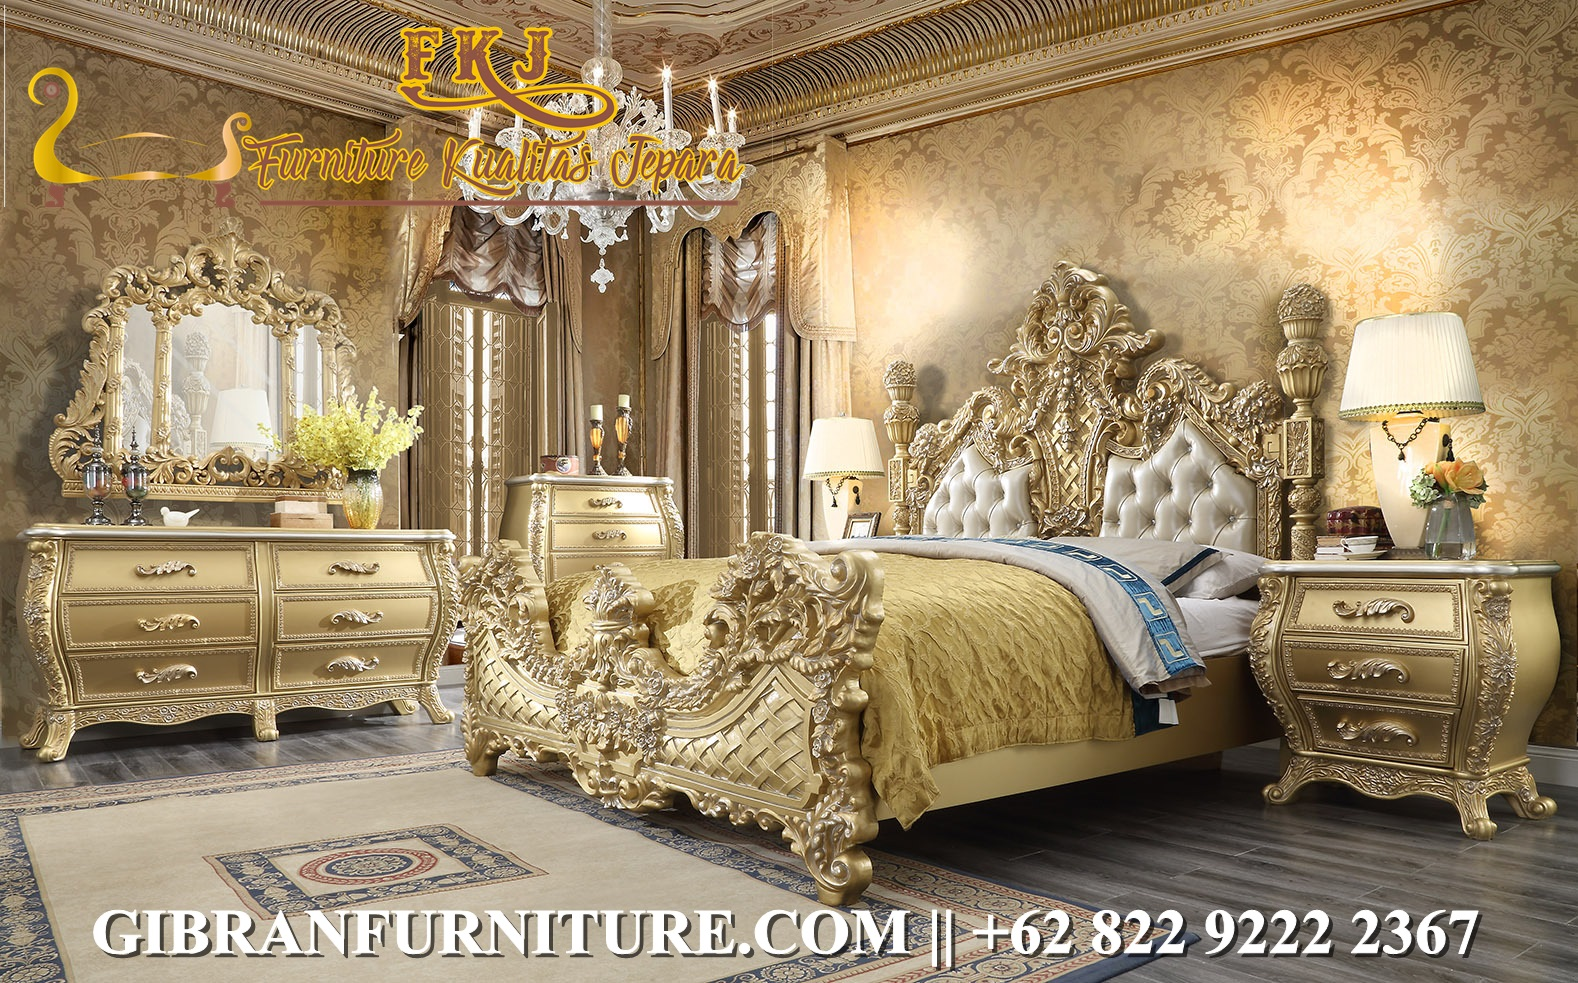 Gambar Tempat Tidur Ukiran Gold Mewah